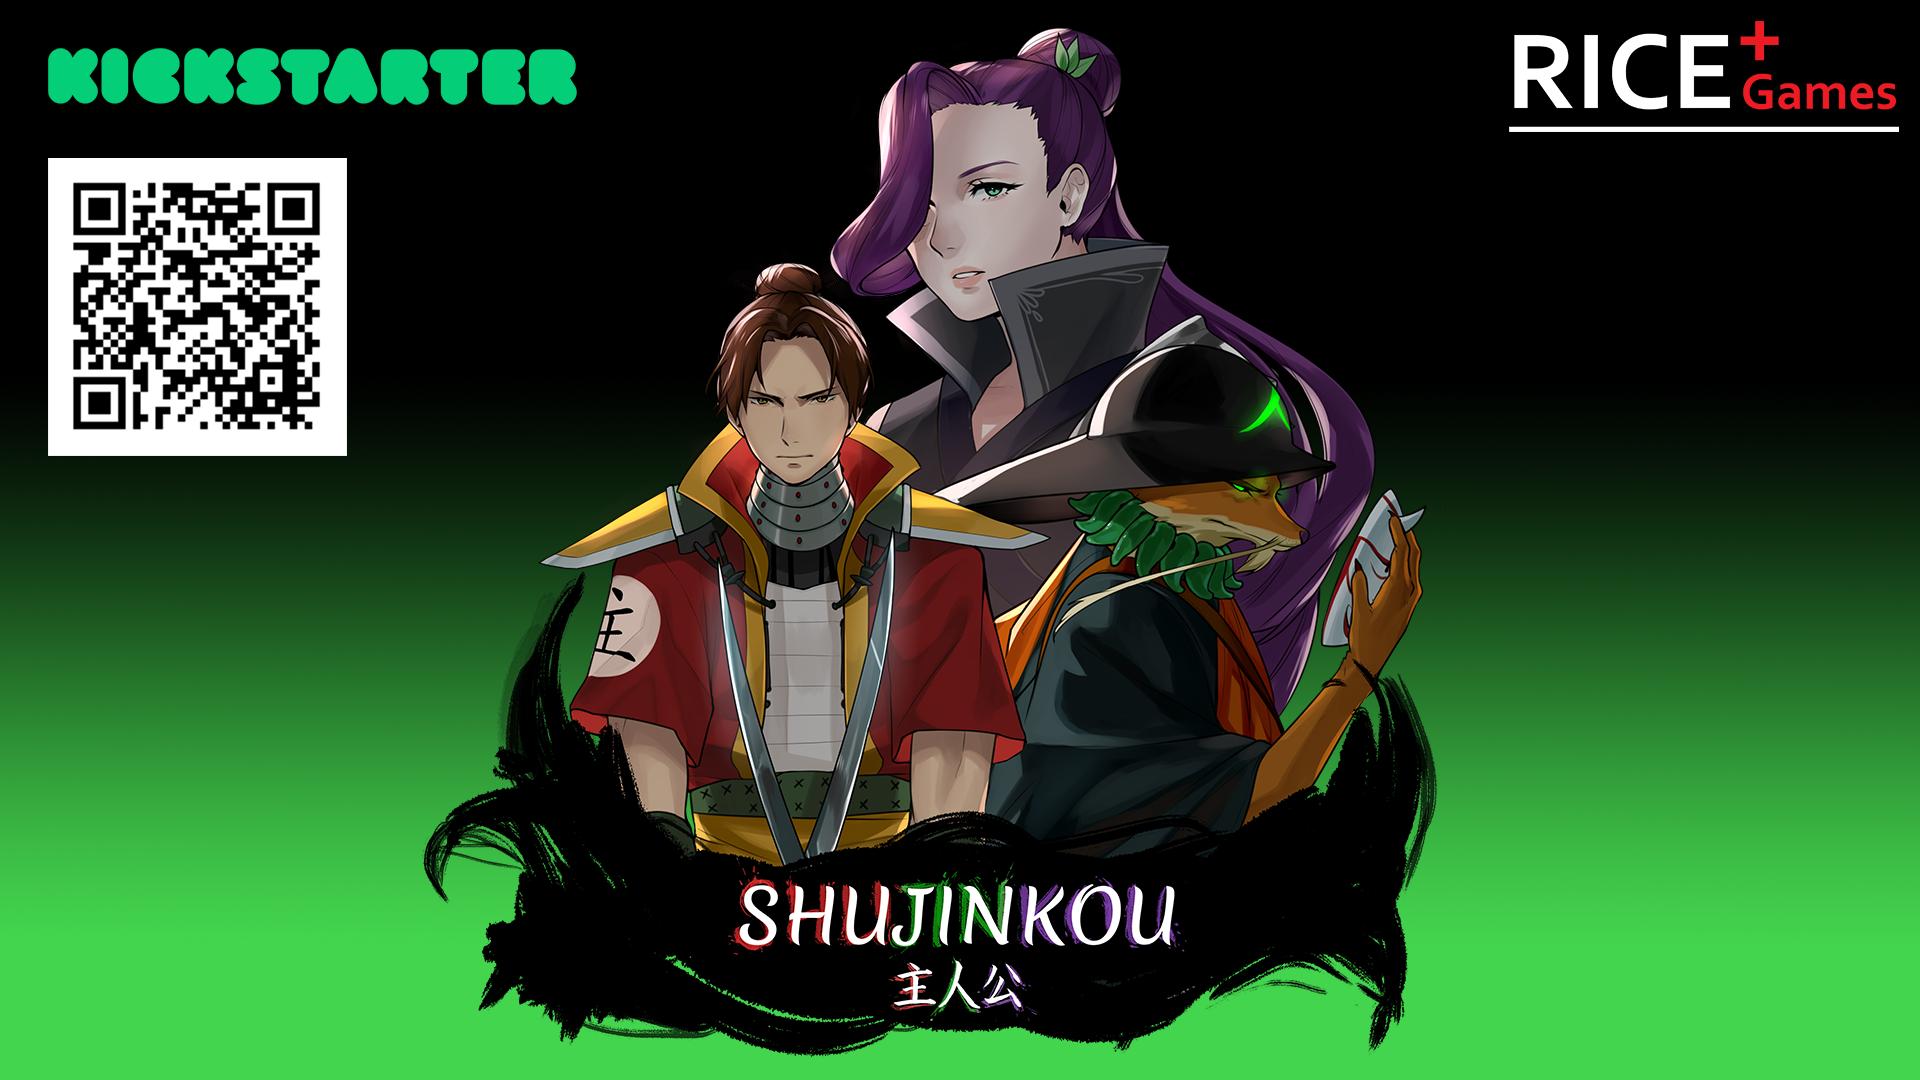 Shujinkou Promotional Image